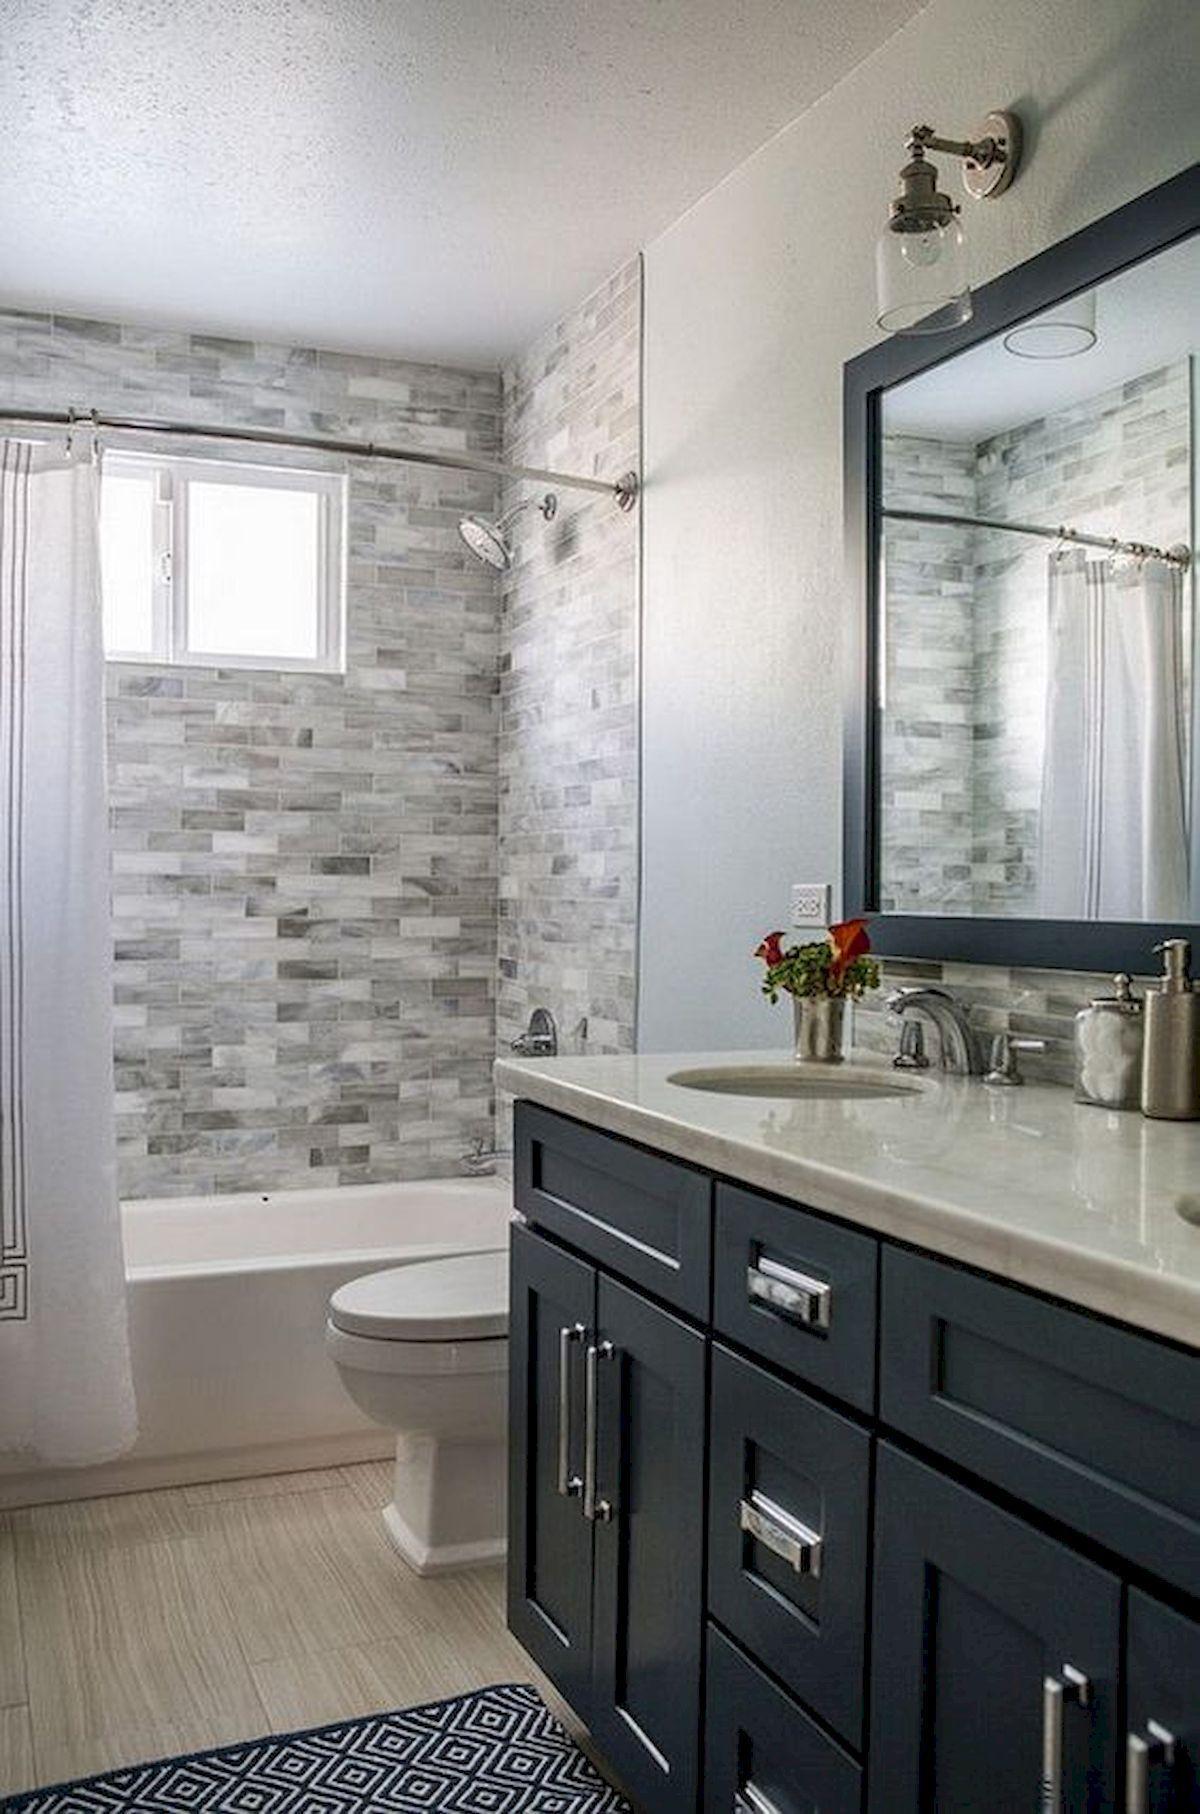 60 Elegant Small Master Bathroom Remodel Ideas 42 Small Bathroom Remodel Bathroom Remodel Master Small Bathroom Decor